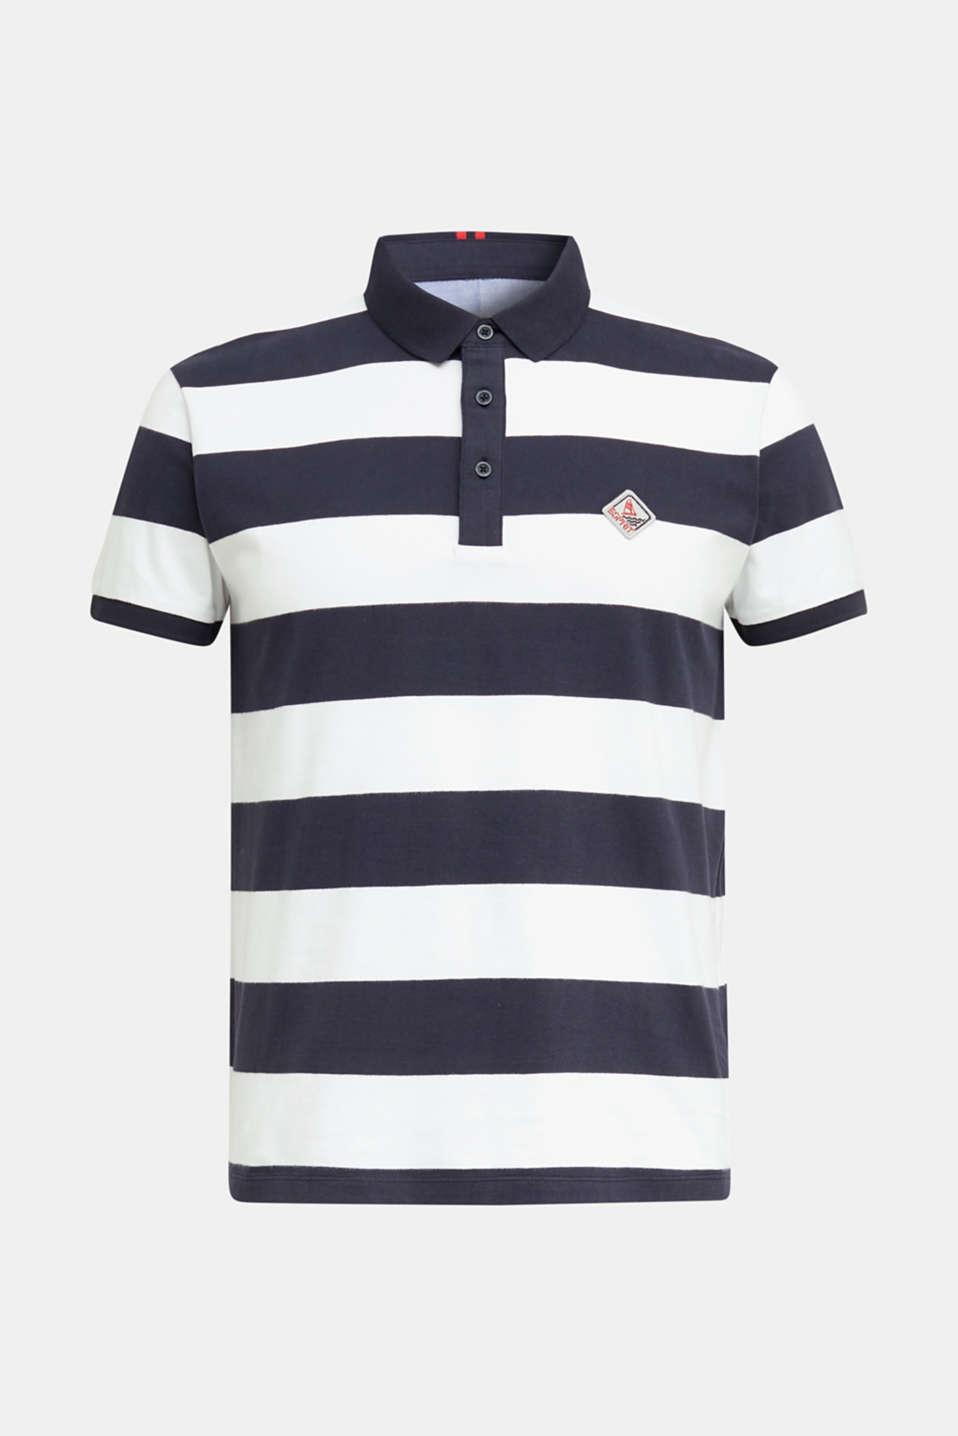 Jersey blouse, 100% organic cotton, NAVY 3, detail image number 7